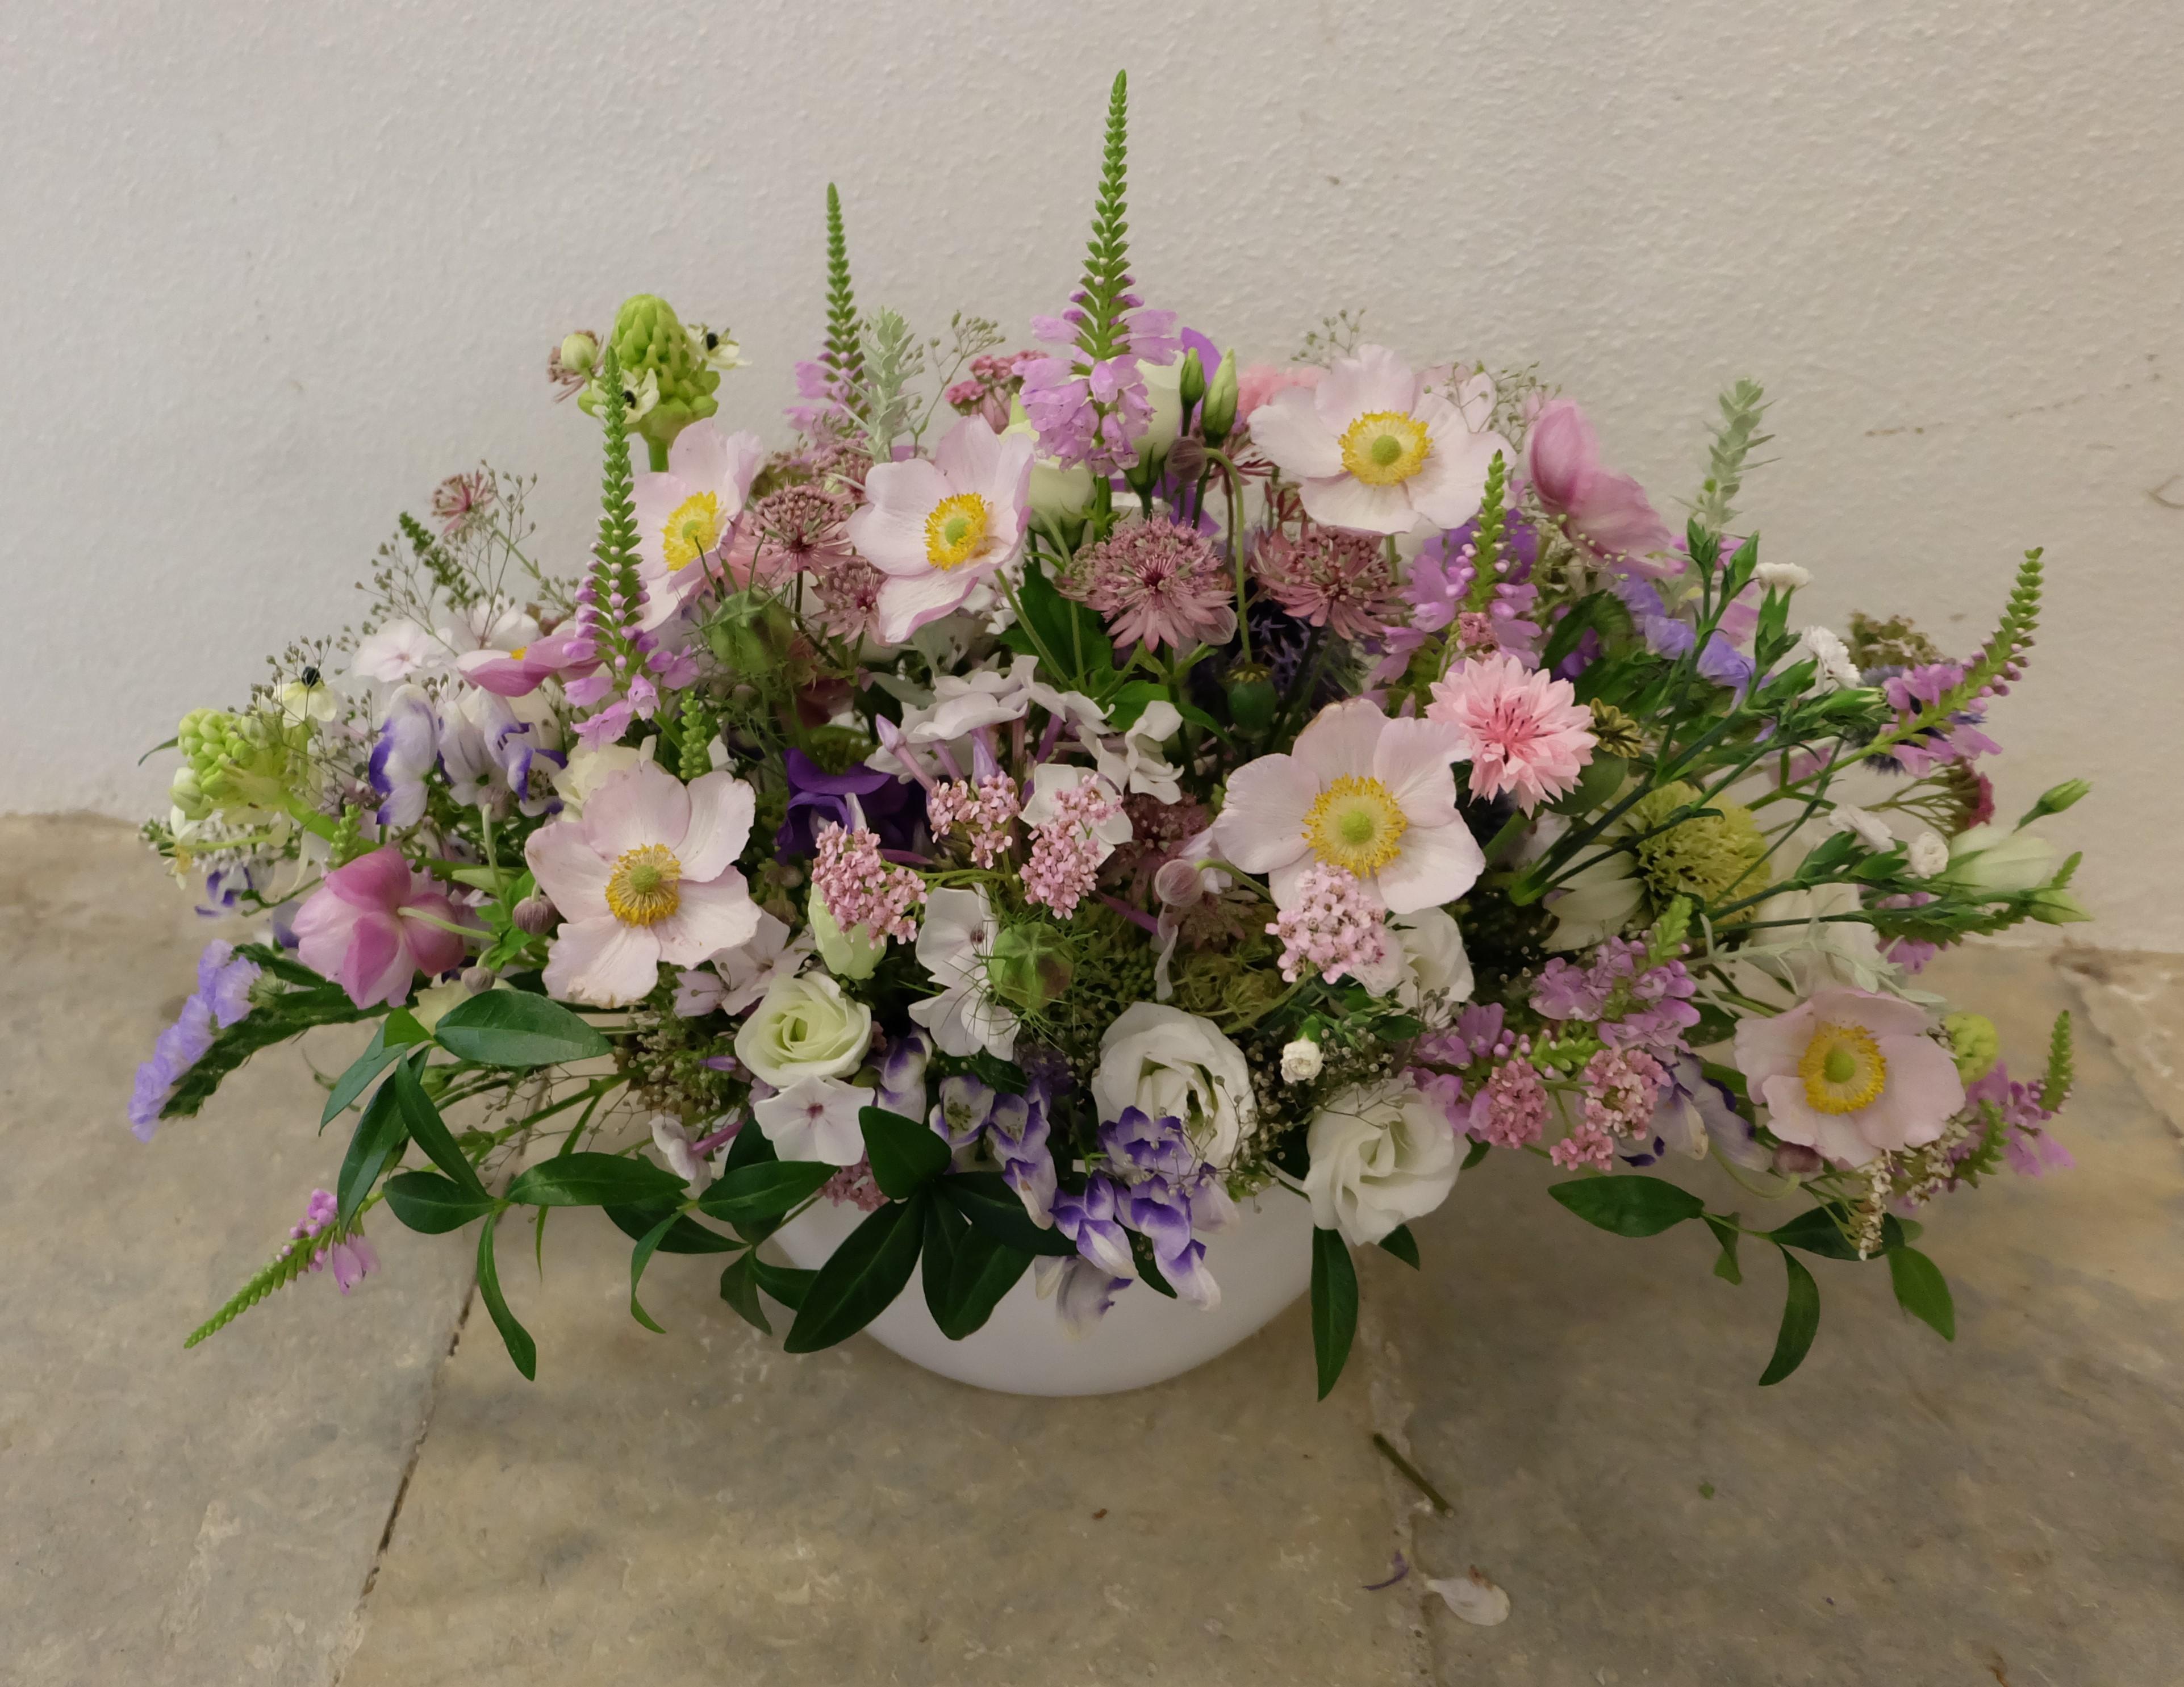 Floristide lilleseade_Hiiumaa Ametikool